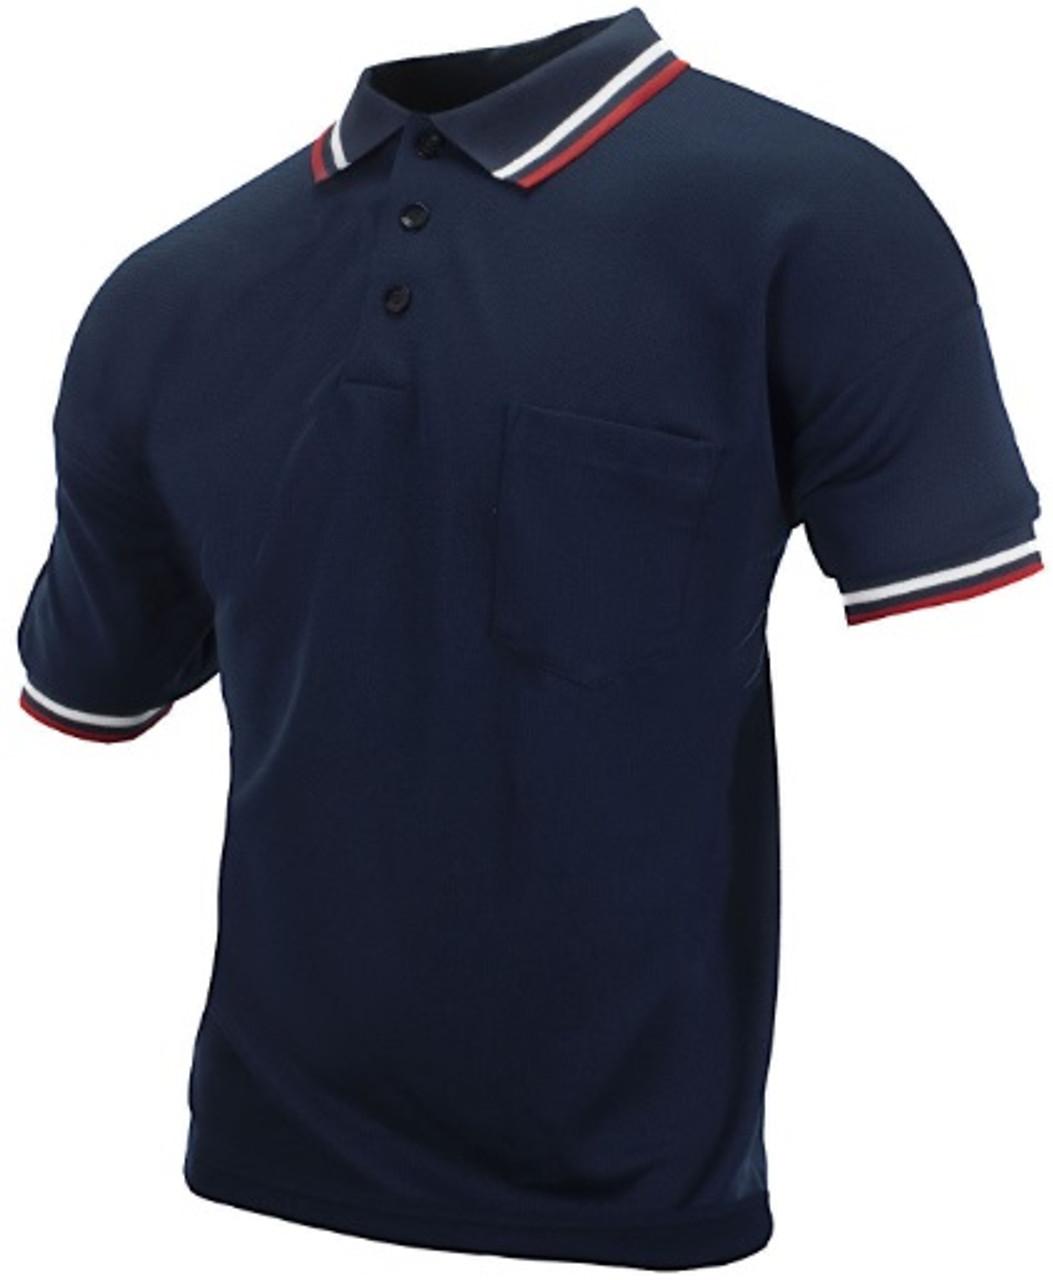 Cliff Keen Embroidered Iowa IHSAA Navy Umpire Shirt